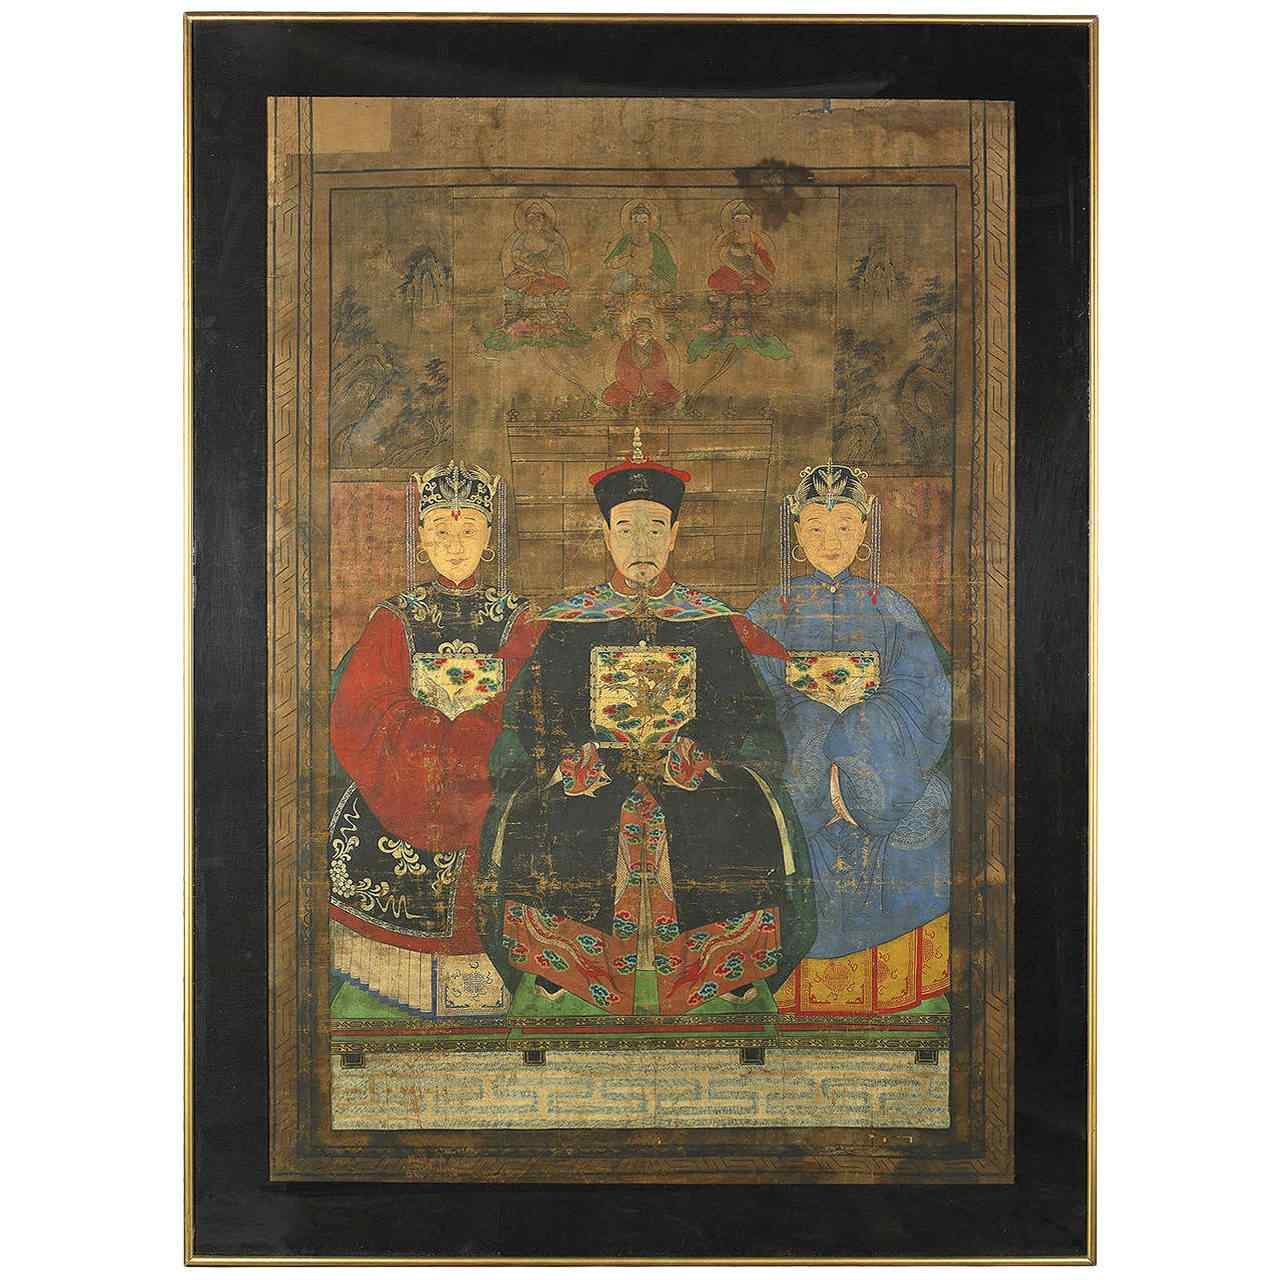 Dignitario imperiale XIX secolo dinastia Qing